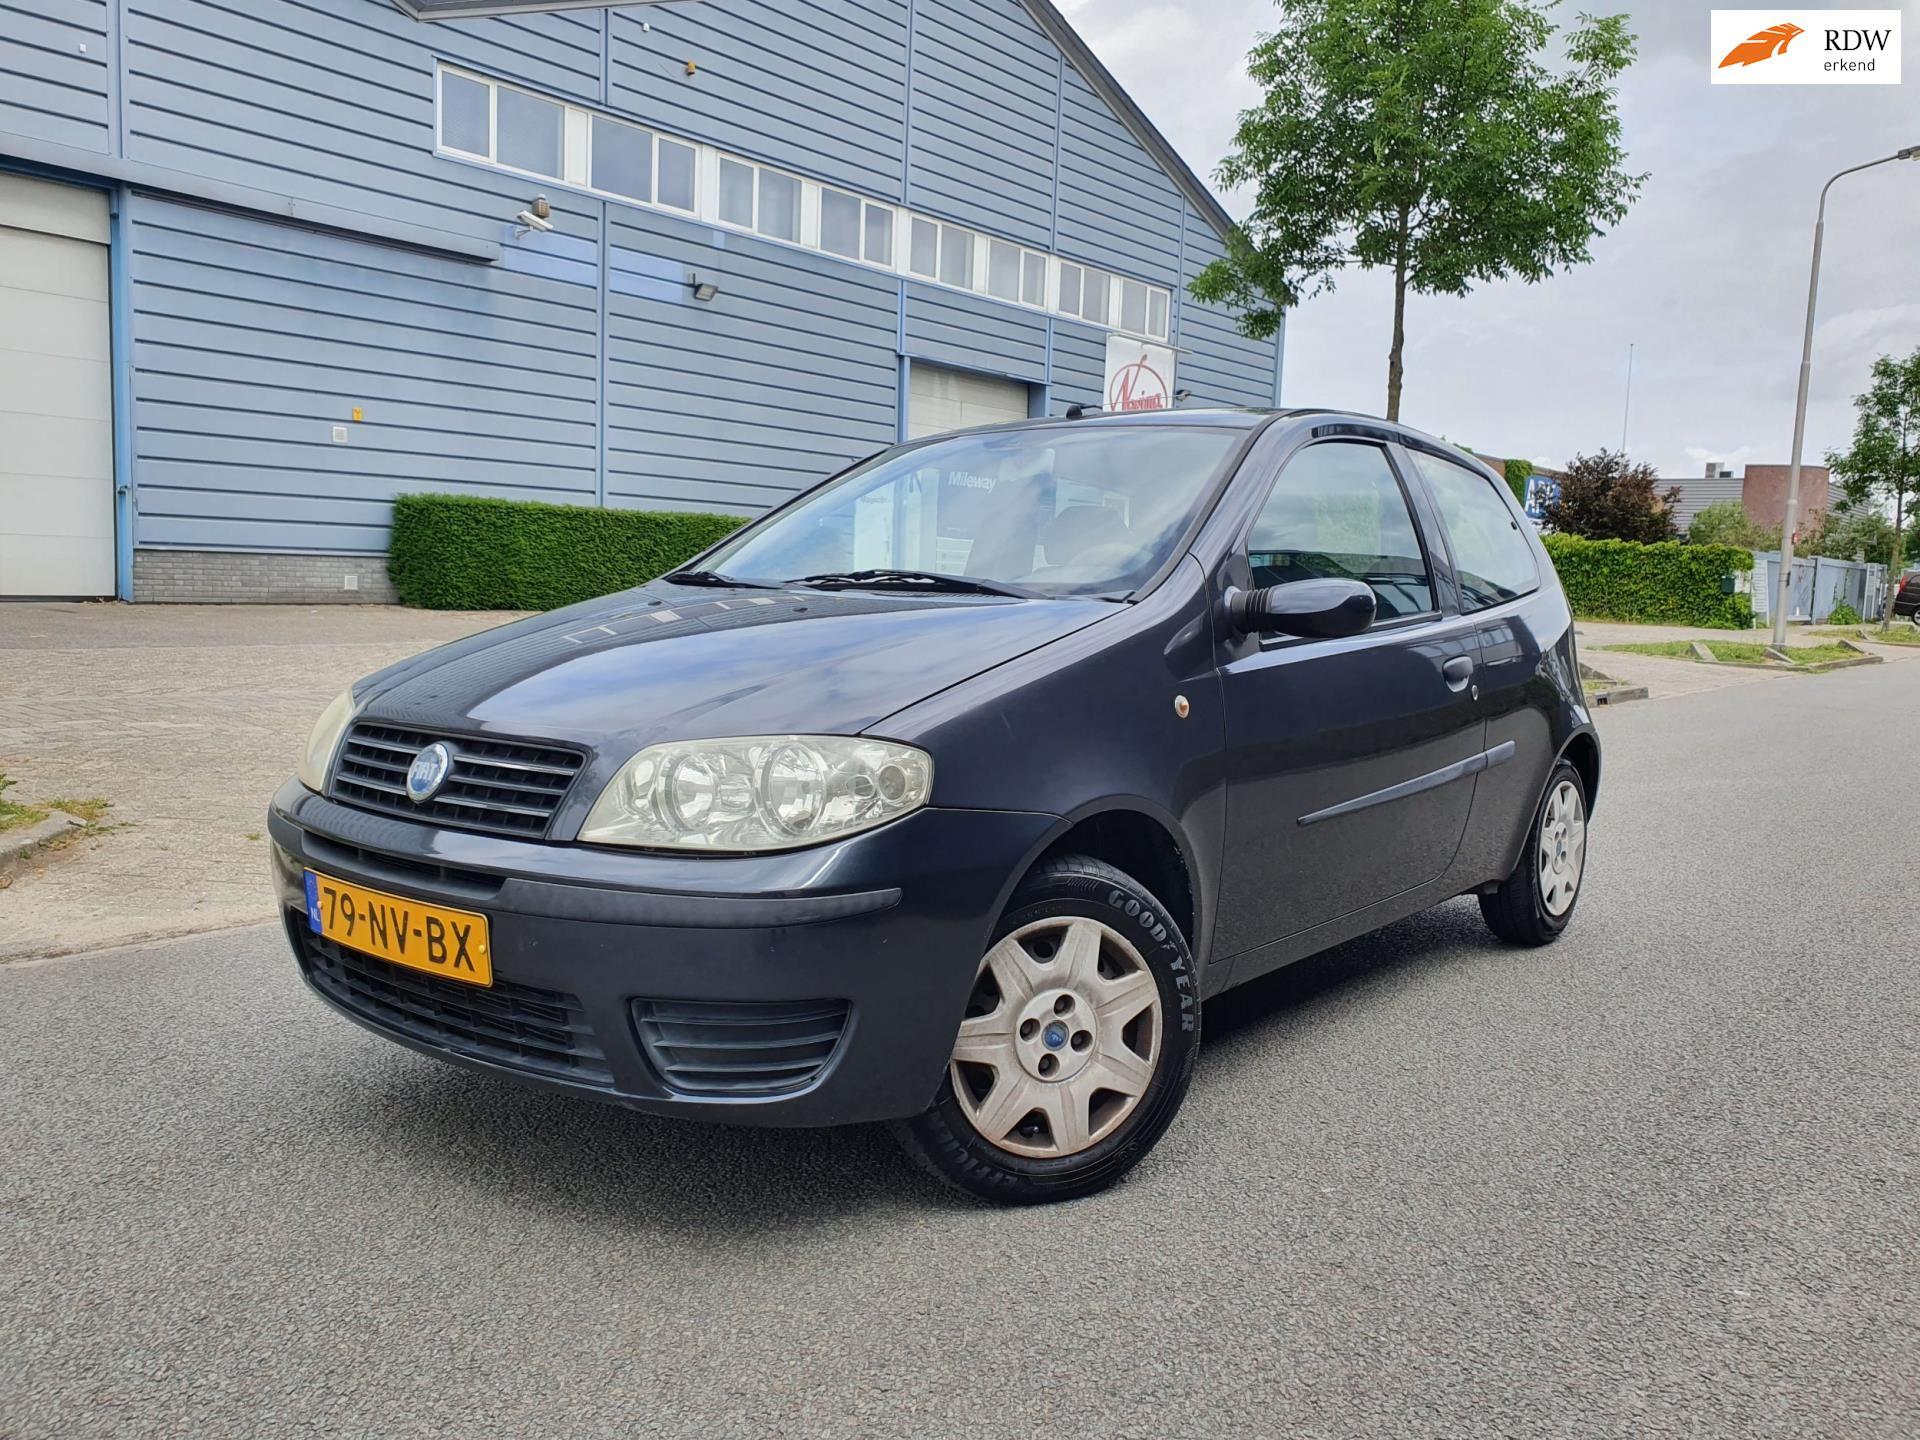 Fiat Punto occasion - Autohandel Direct